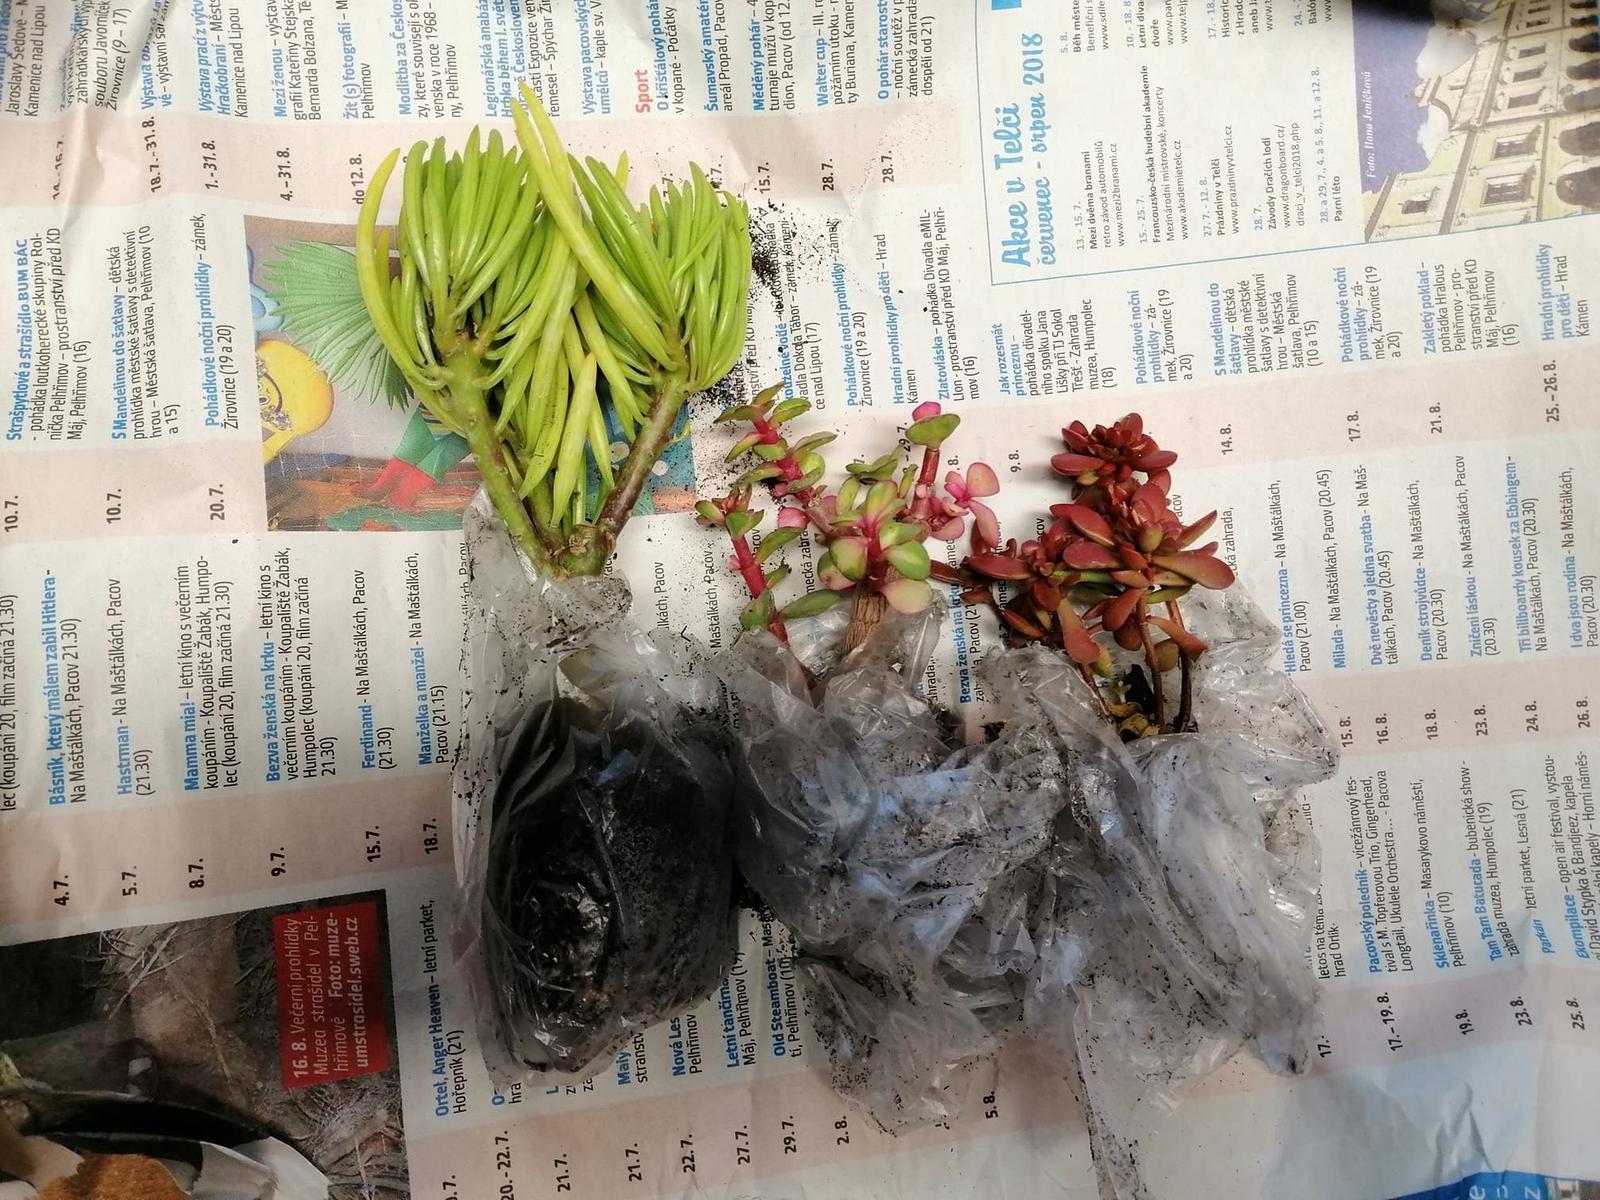 "Naše podkroví + zahrada - Zleva: Senecio barbertonicus (Jižní Afrika), Portulacaria afra ""Tricolor"", Crassula pubescens ssp. radicans (Jižní Afrika)"